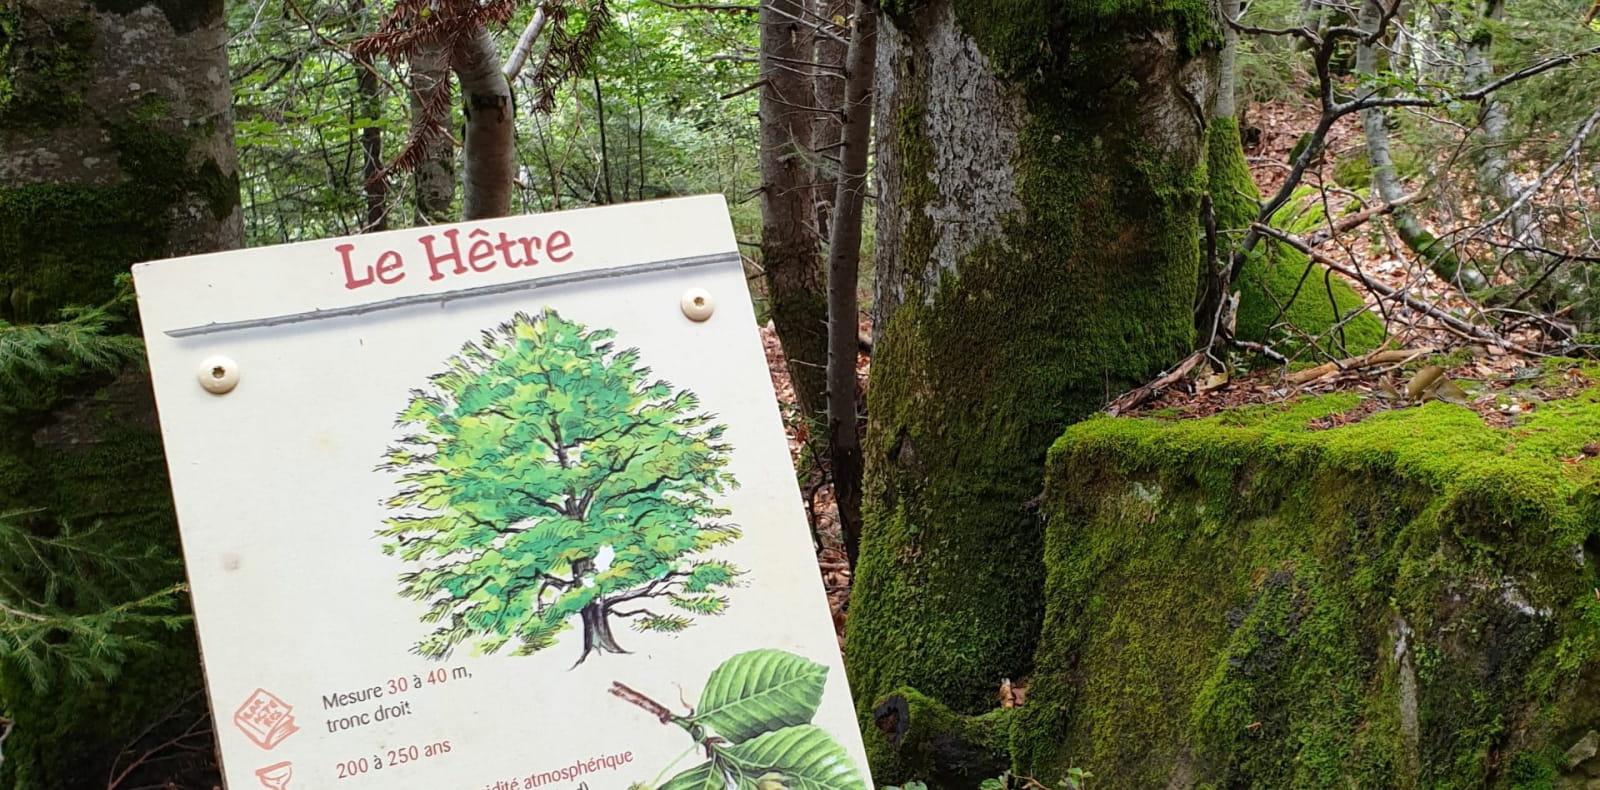 Panneau explicatif arboretum